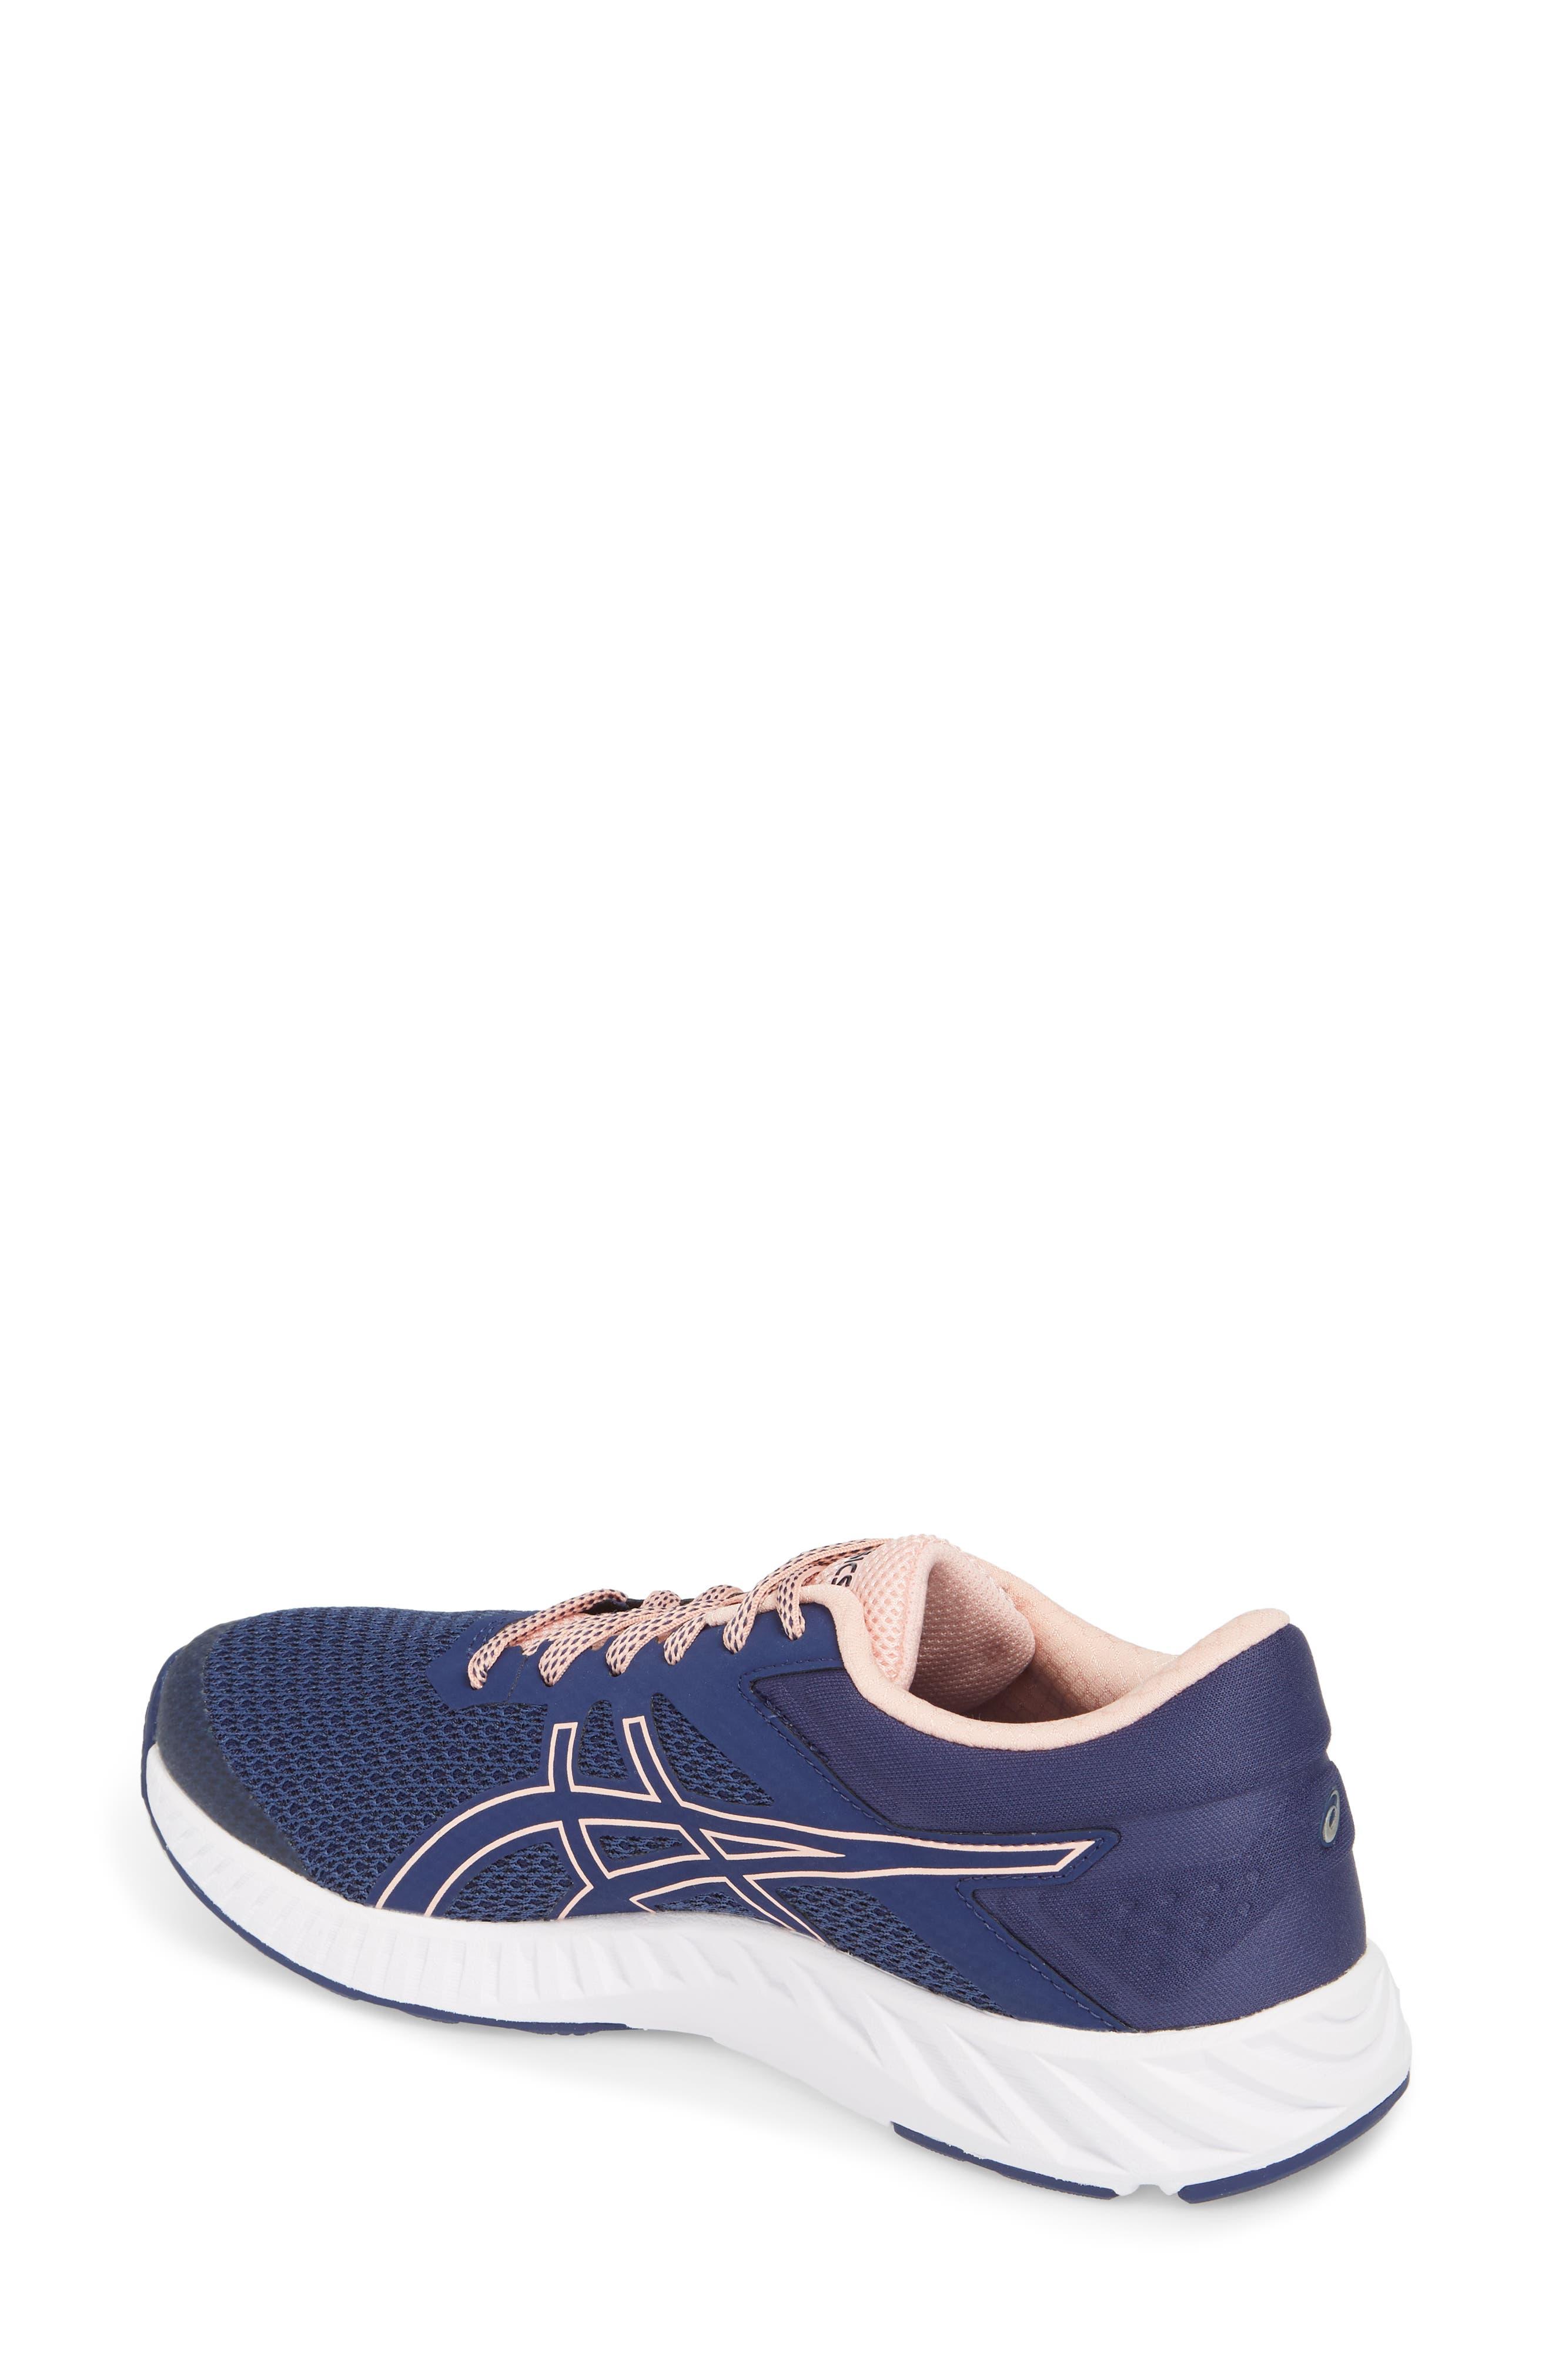 FuzeX Lyte 2 Running Shoe,                             Alternate thumbnail 2, color,                             INDIGO BLUE/ FROSTED ROSE